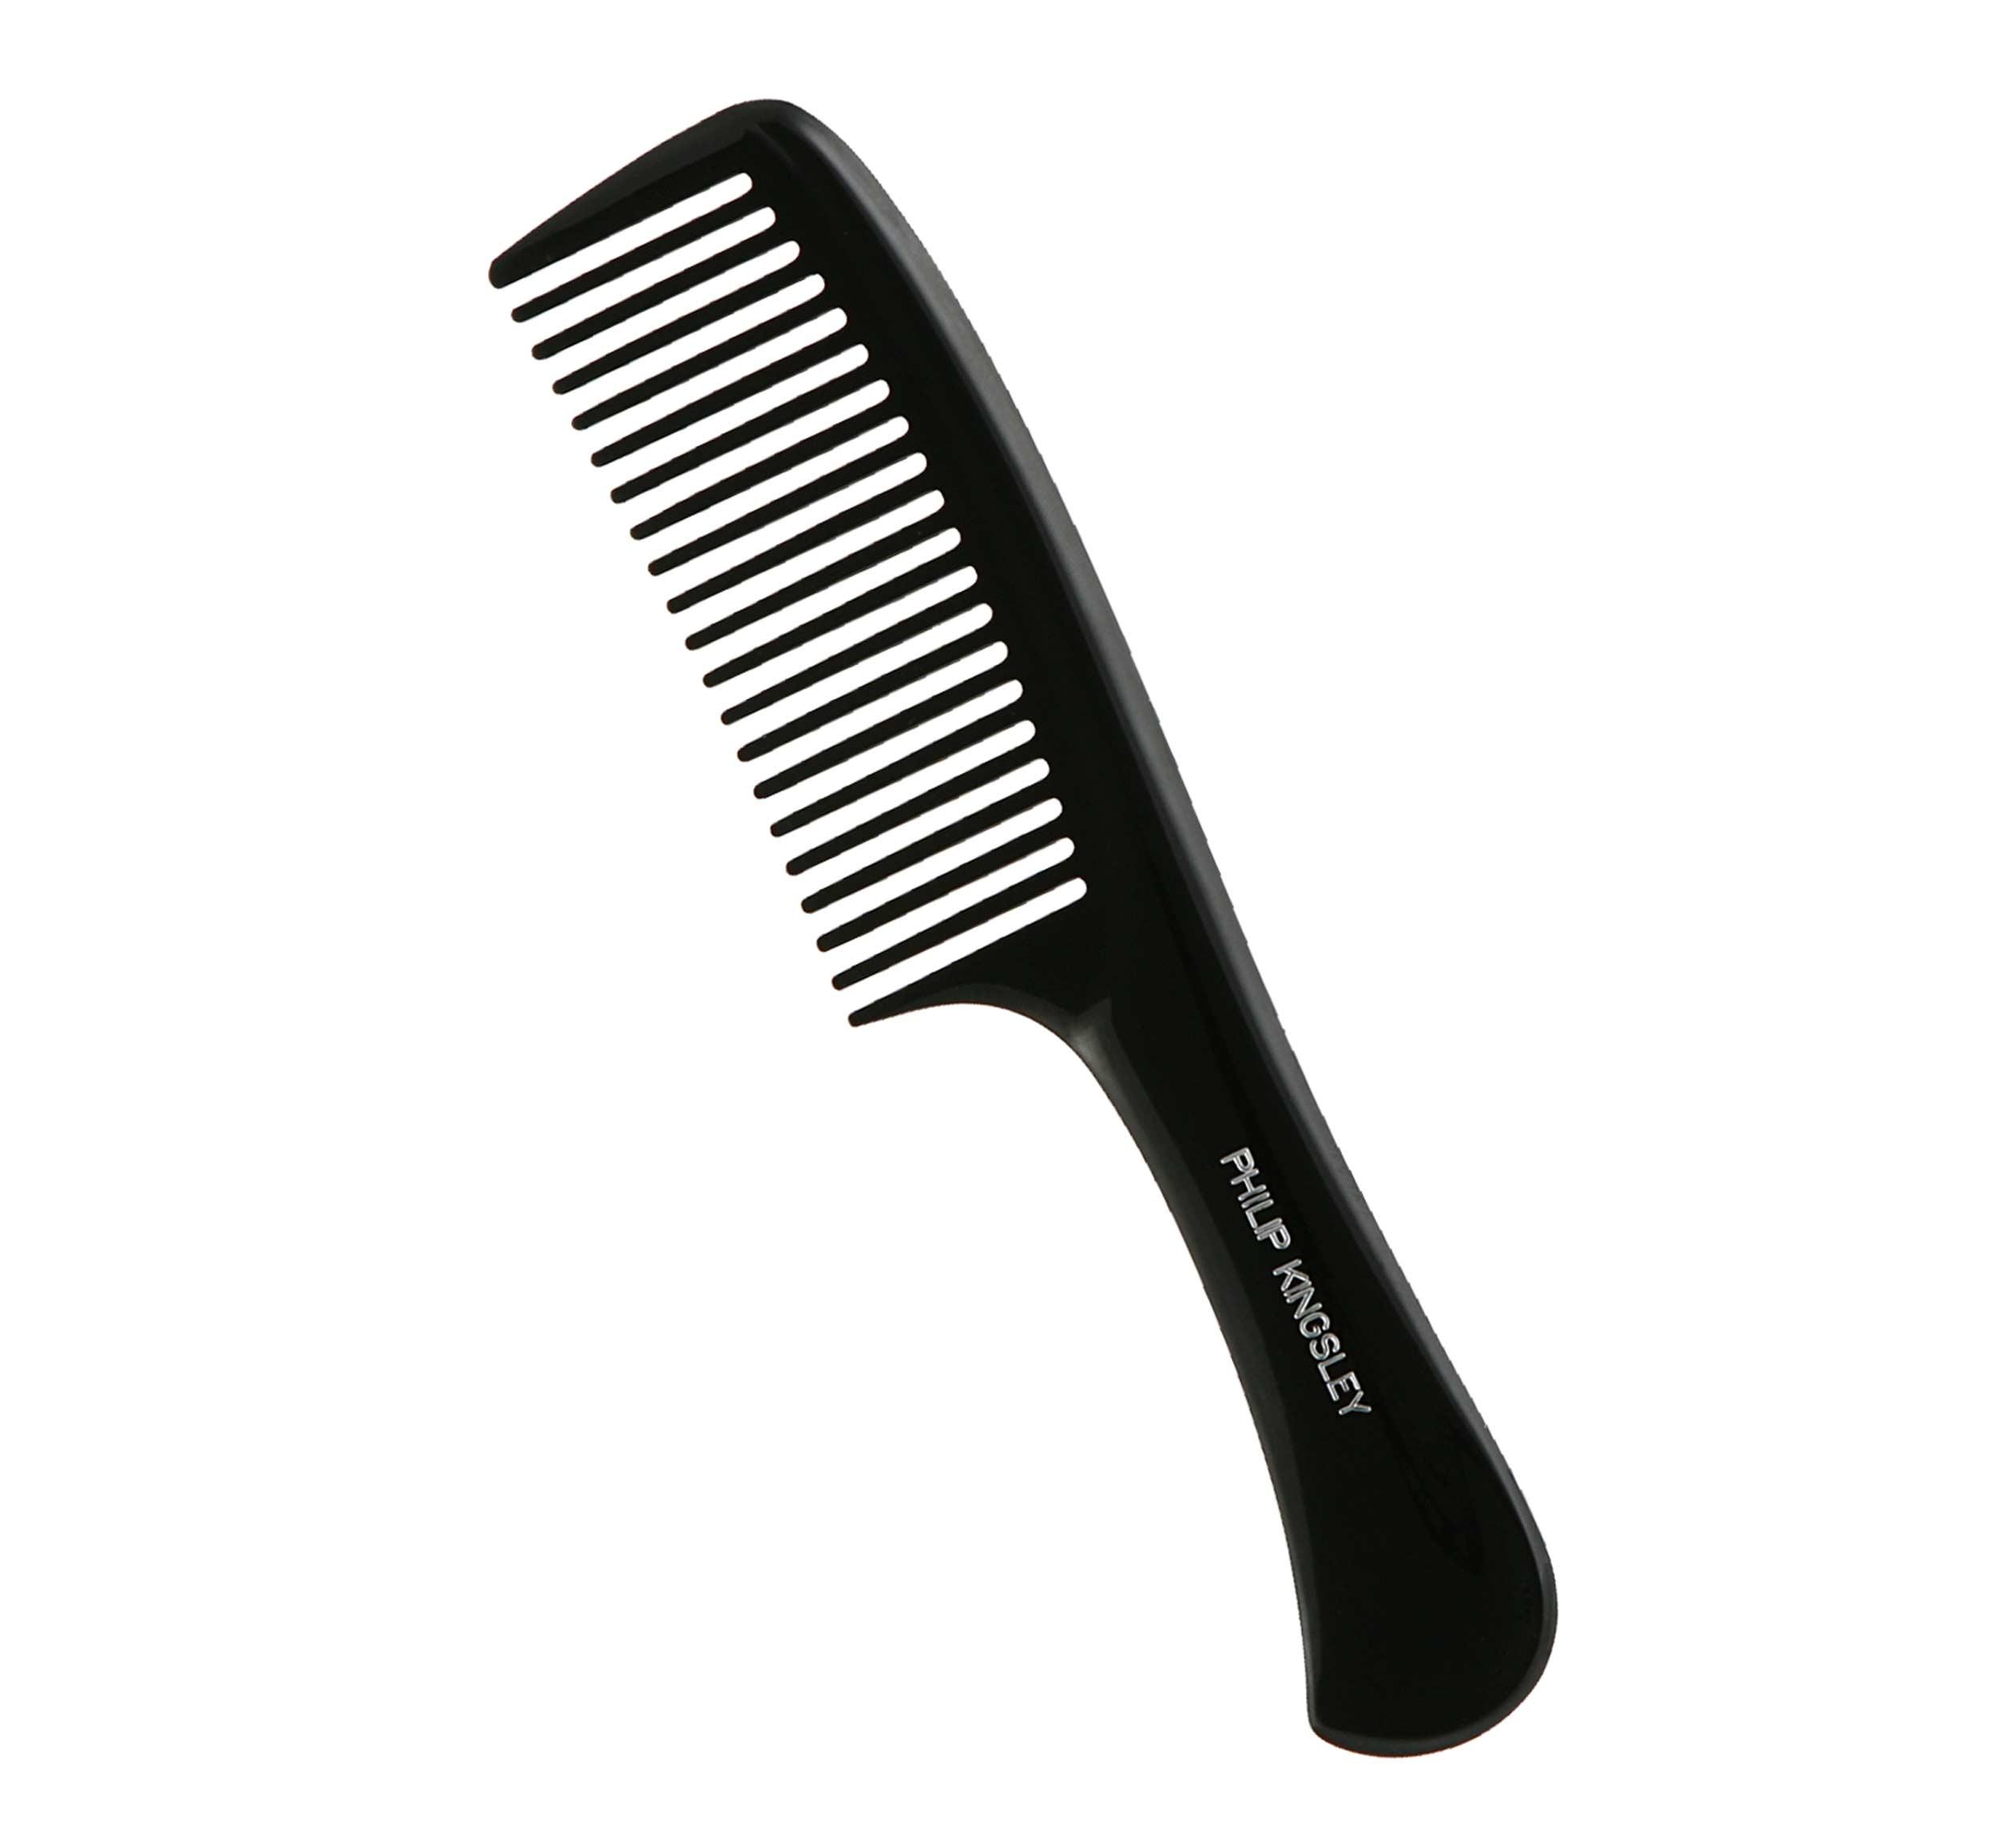 http://gr.strawberrynet.com/haircare/philip-kingsley/